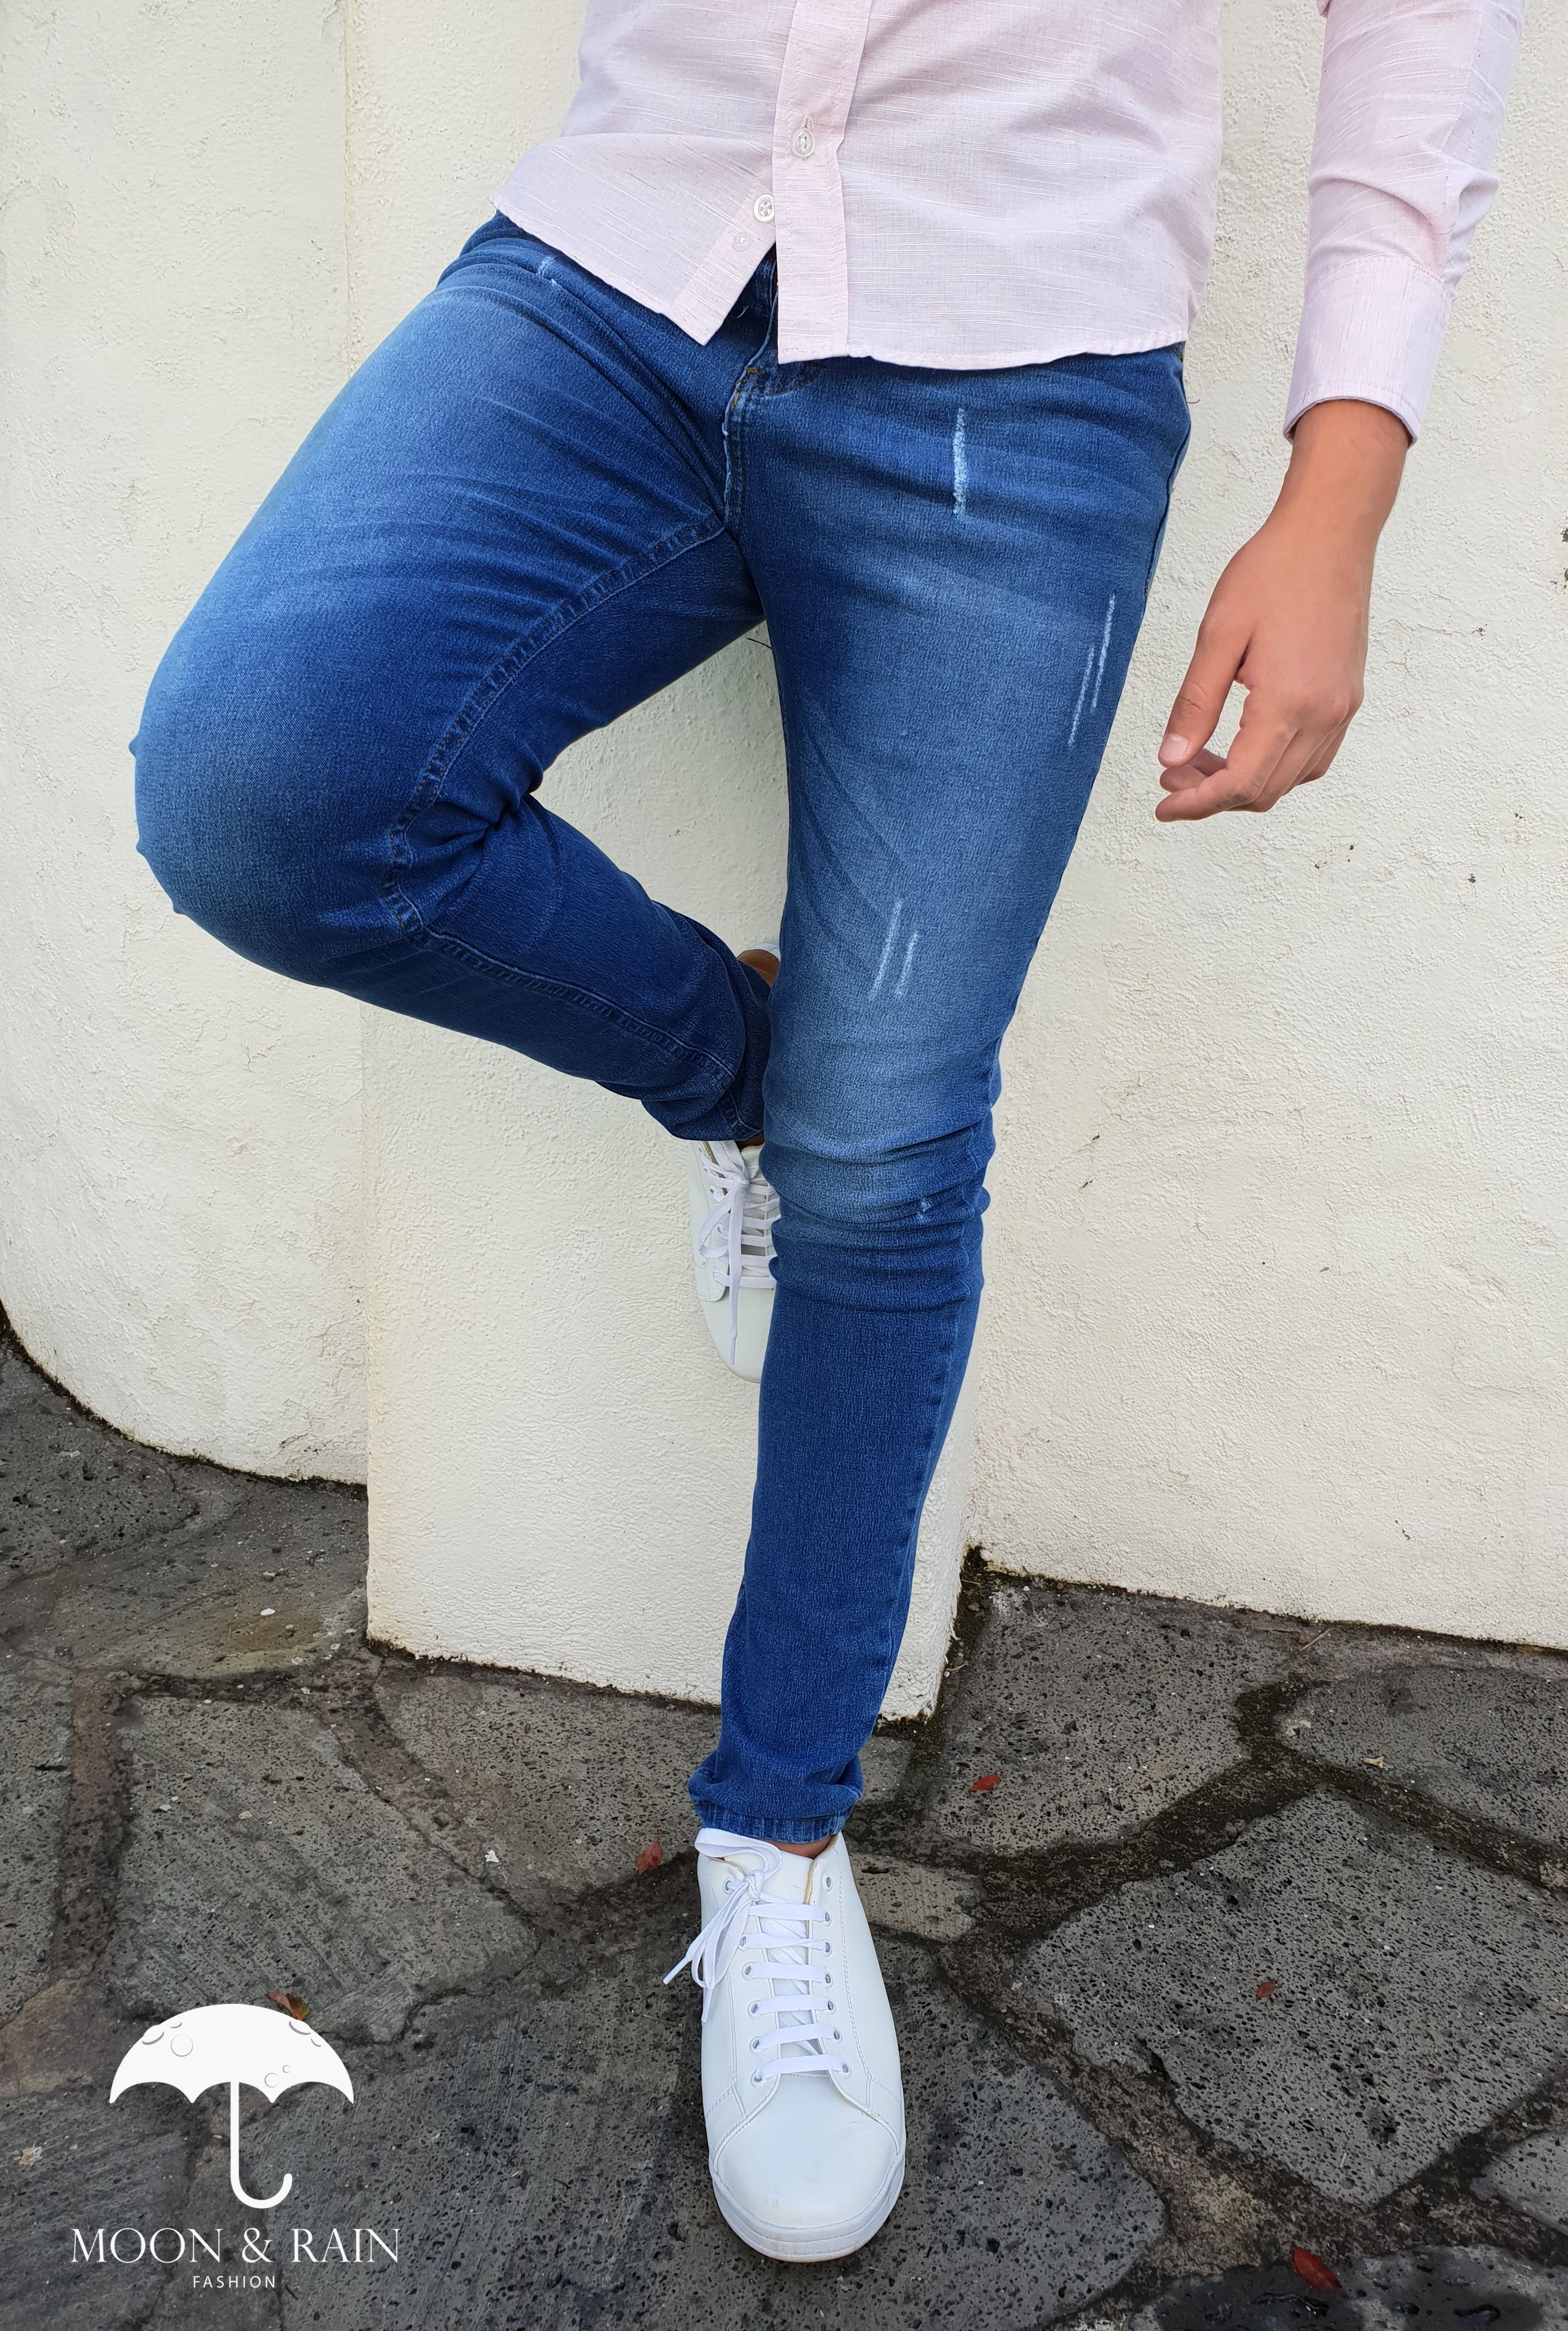 Pantalon De Mezclilla Azul Con Rasgadura Ropa Para Hombres Jovenes Vestimenta Casual Hombres Ropa De Moda Hombre